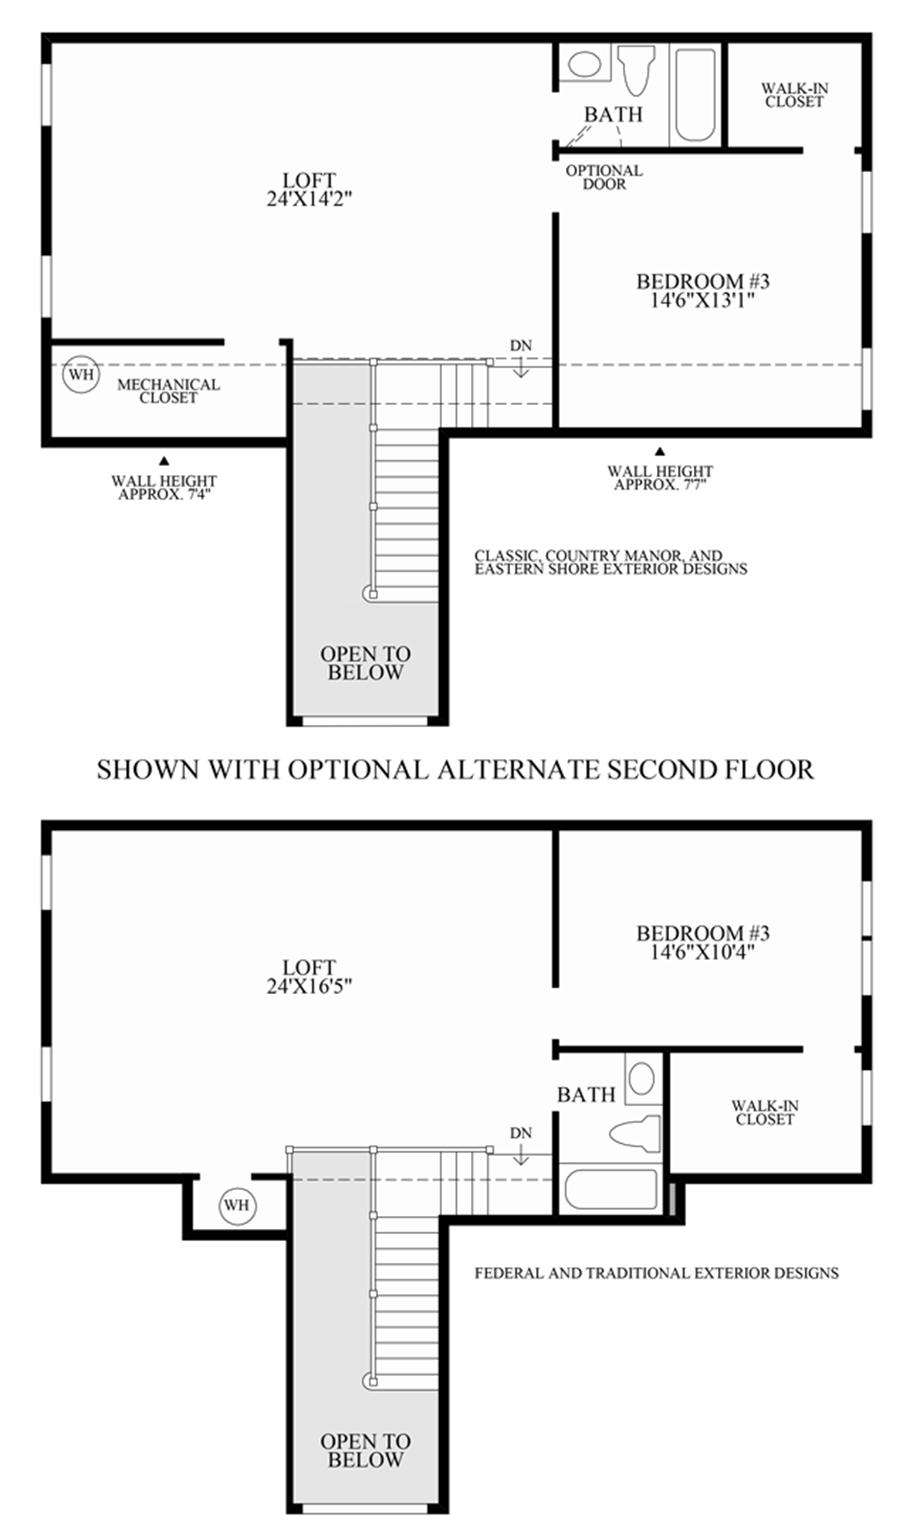 Optional 2nd Floors Floor Plan